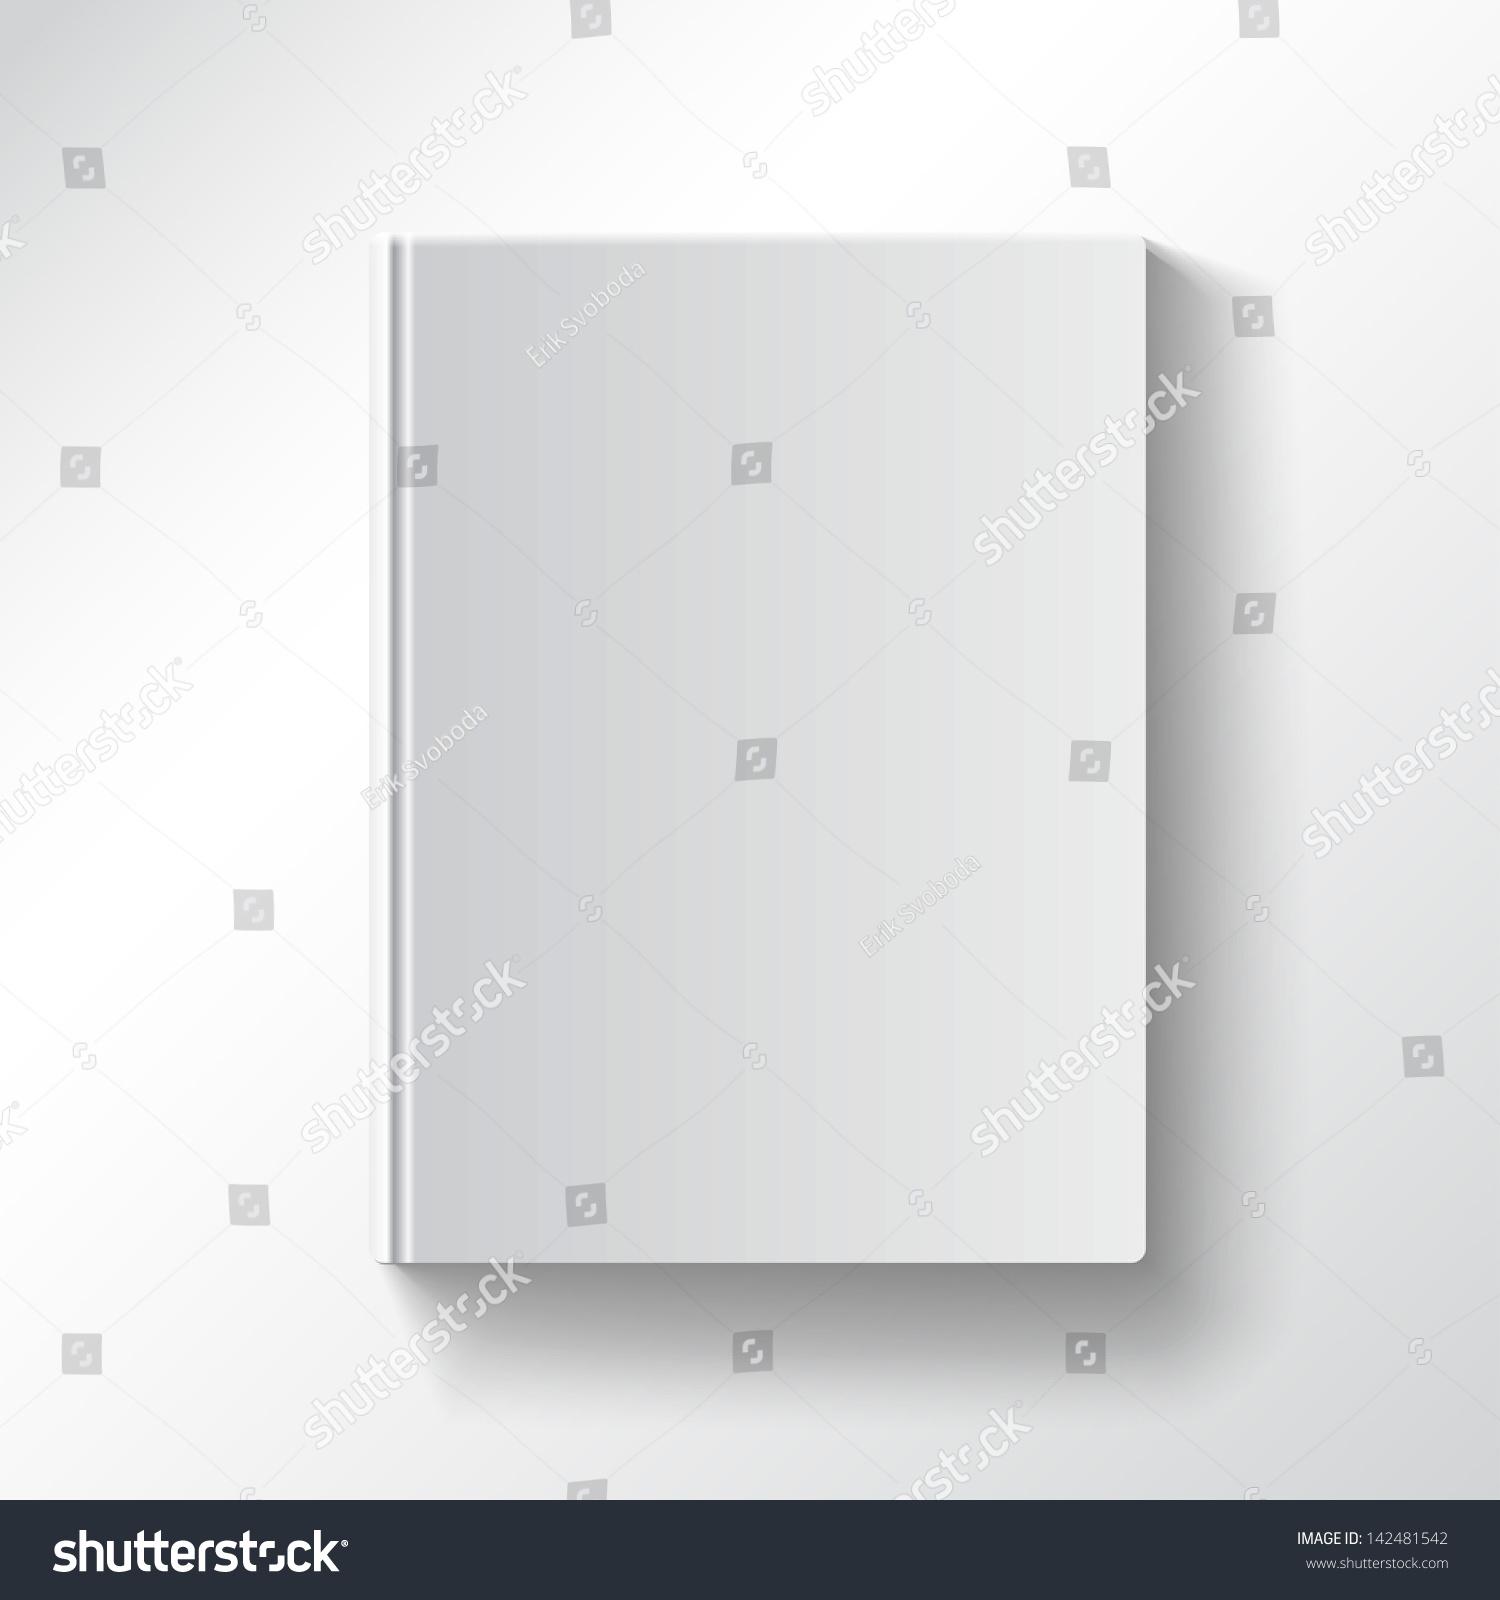 Book Cover Design Blank : Blank book cover vector illustration gradient vectores en